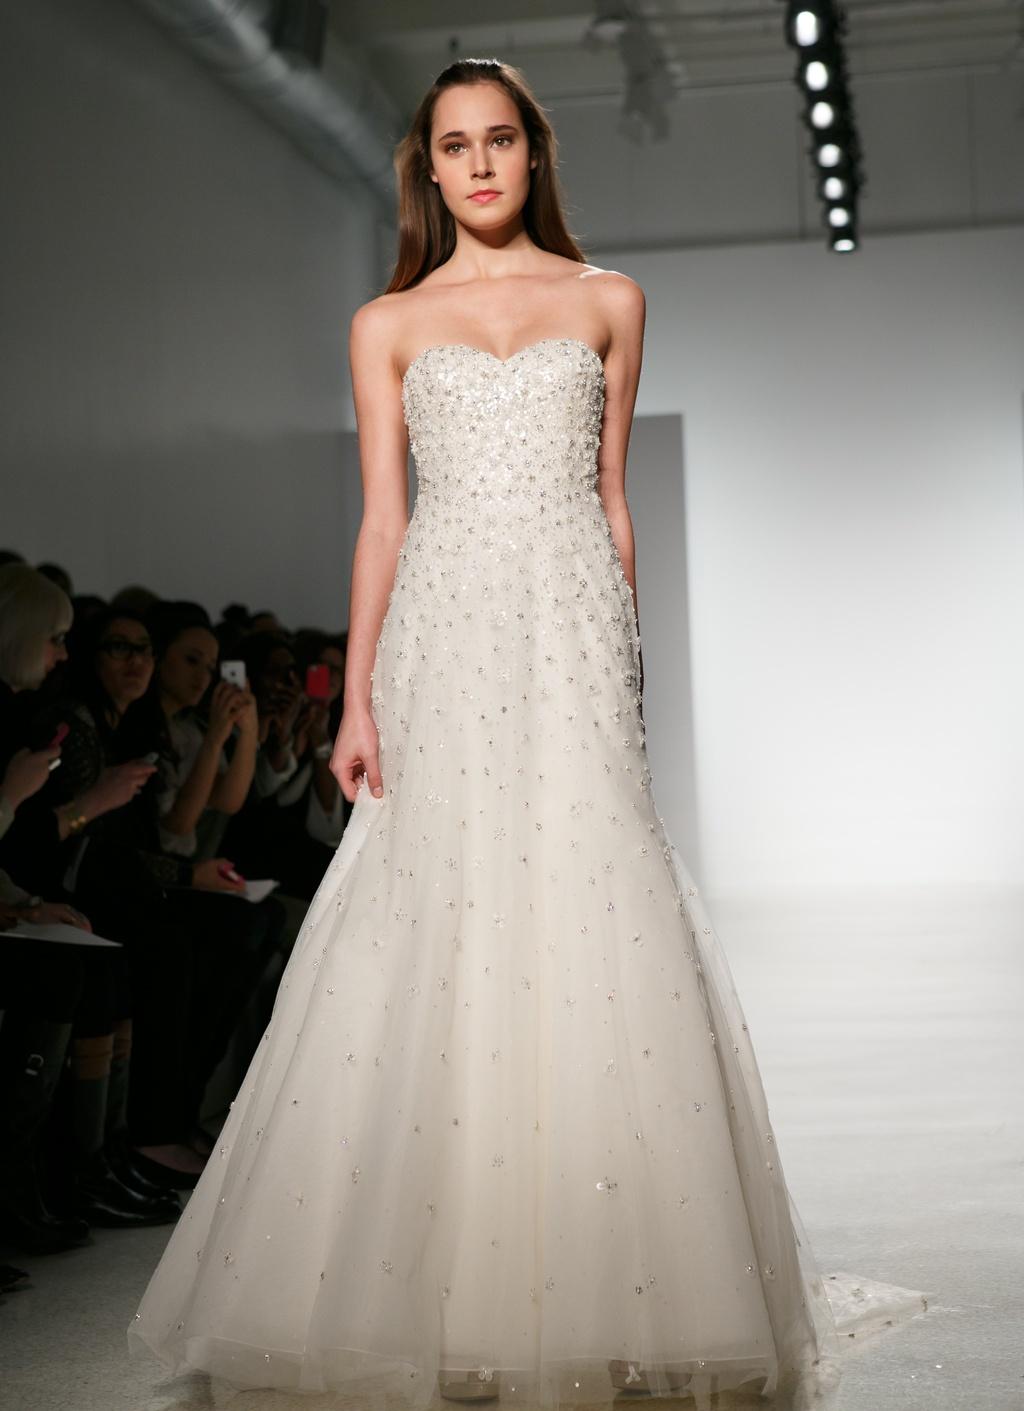 Christos-wedding-dress-spring-2014-bridal-5b.full